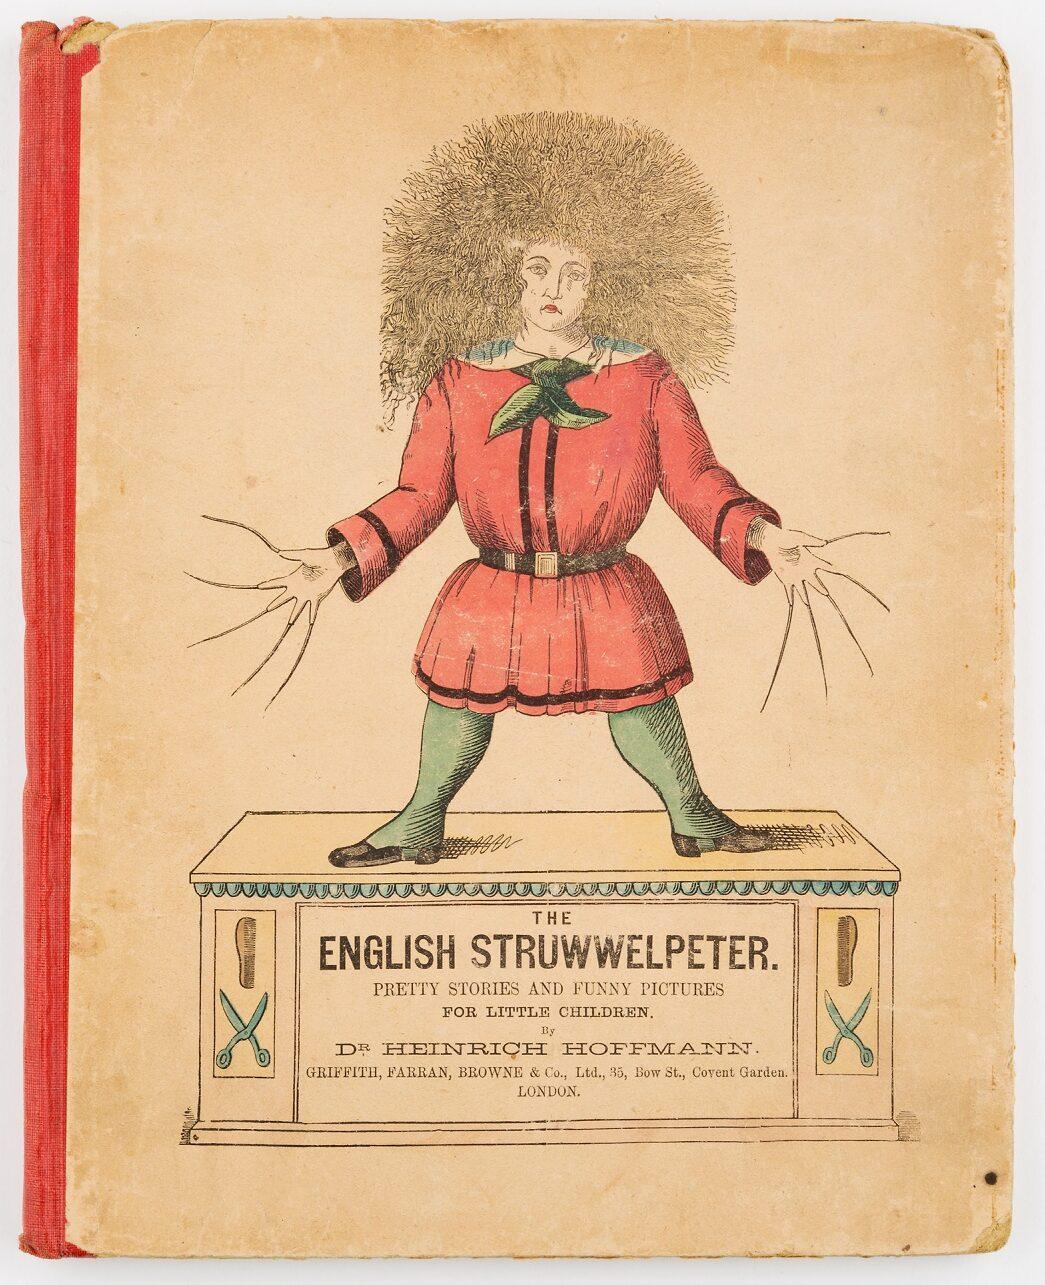 The original 'Struwwelpeter' in English.